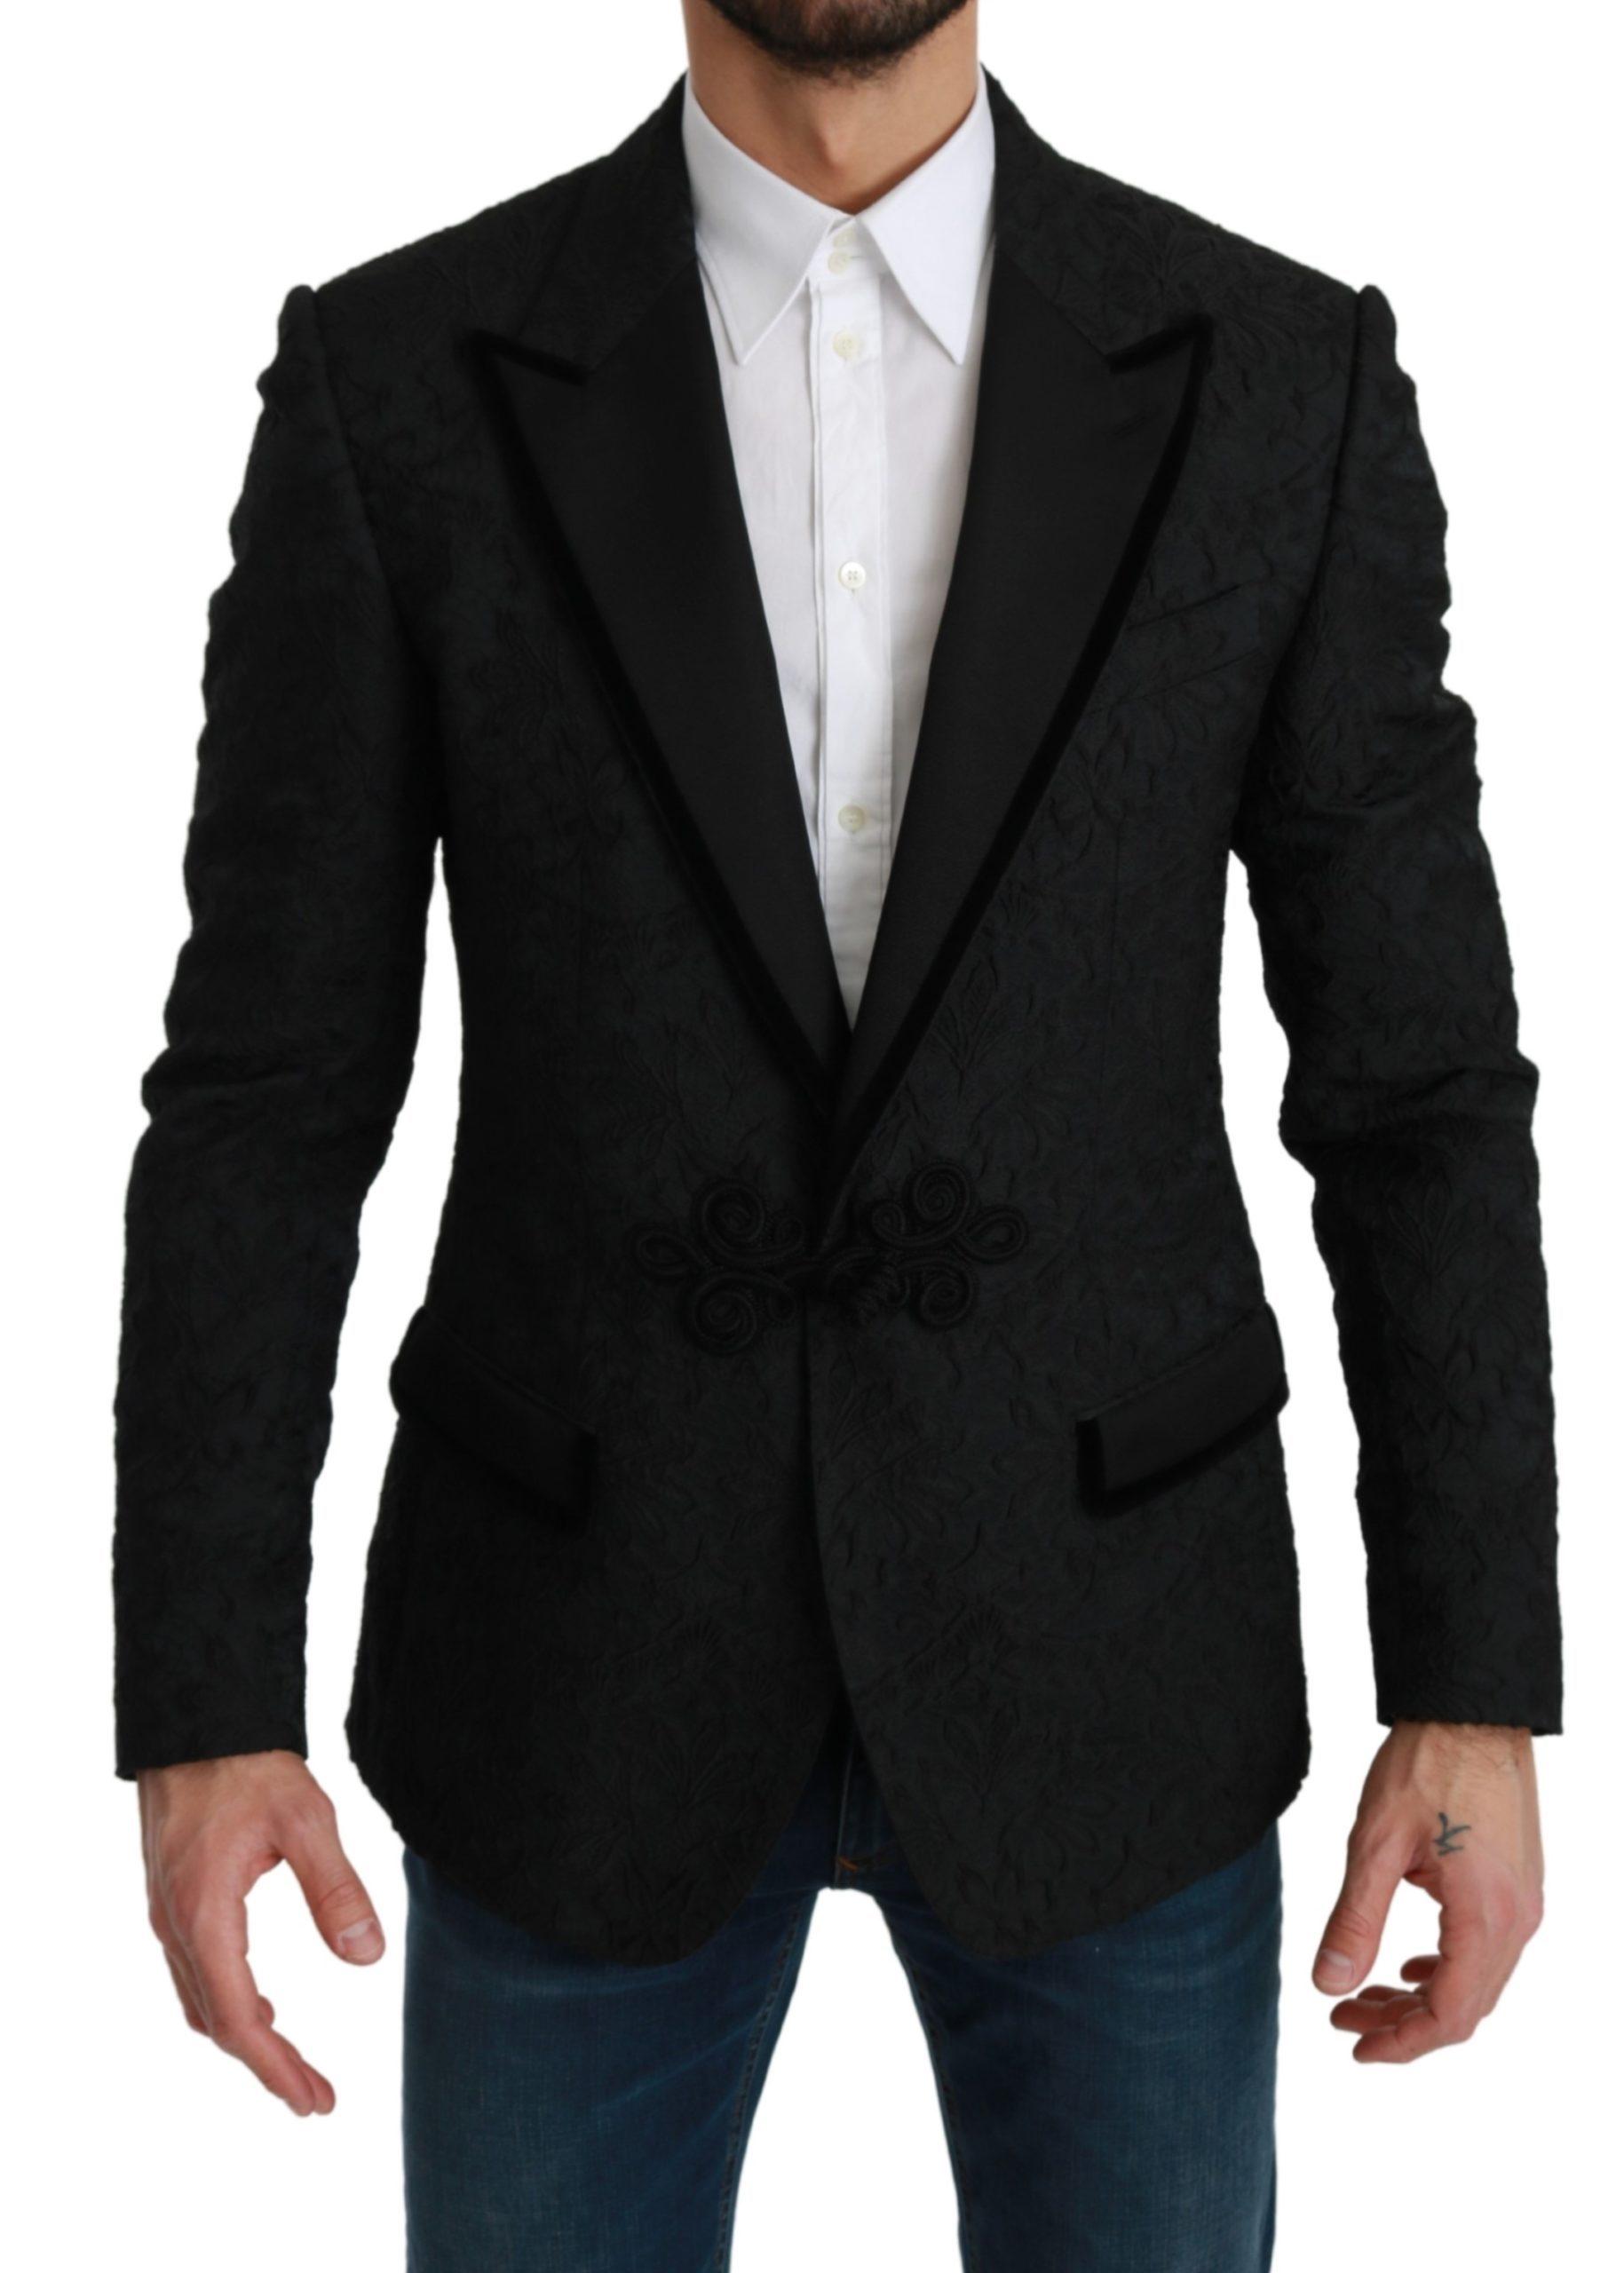 Dolce & Gabbana Men's Torero Slim Fit Blazer Black KOS1779 - IT54   XL